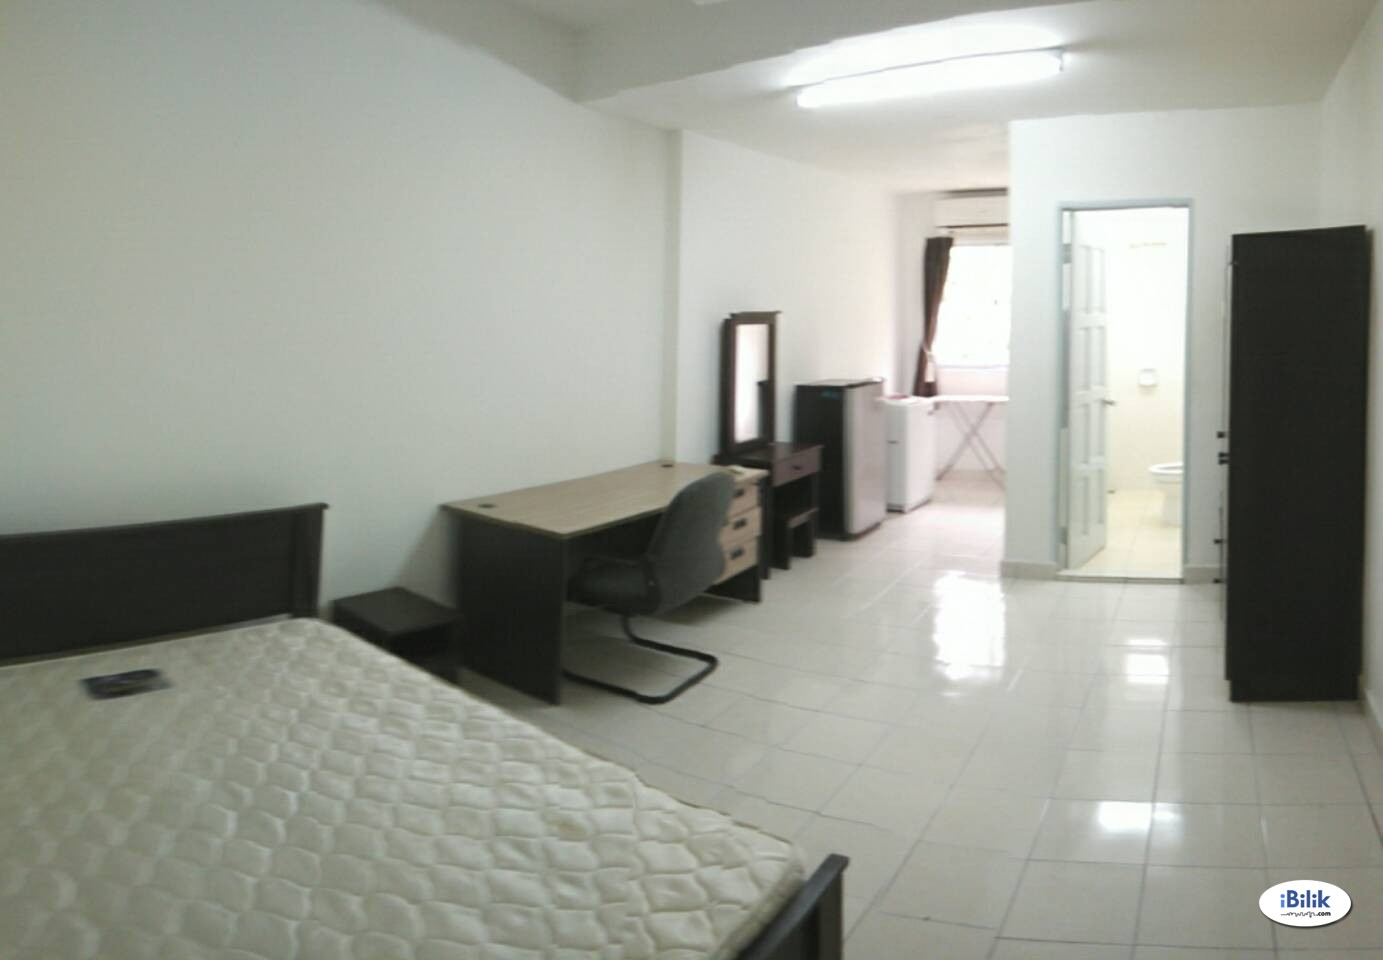 Middle Room at Bandar Sunway, Petaling Jaya